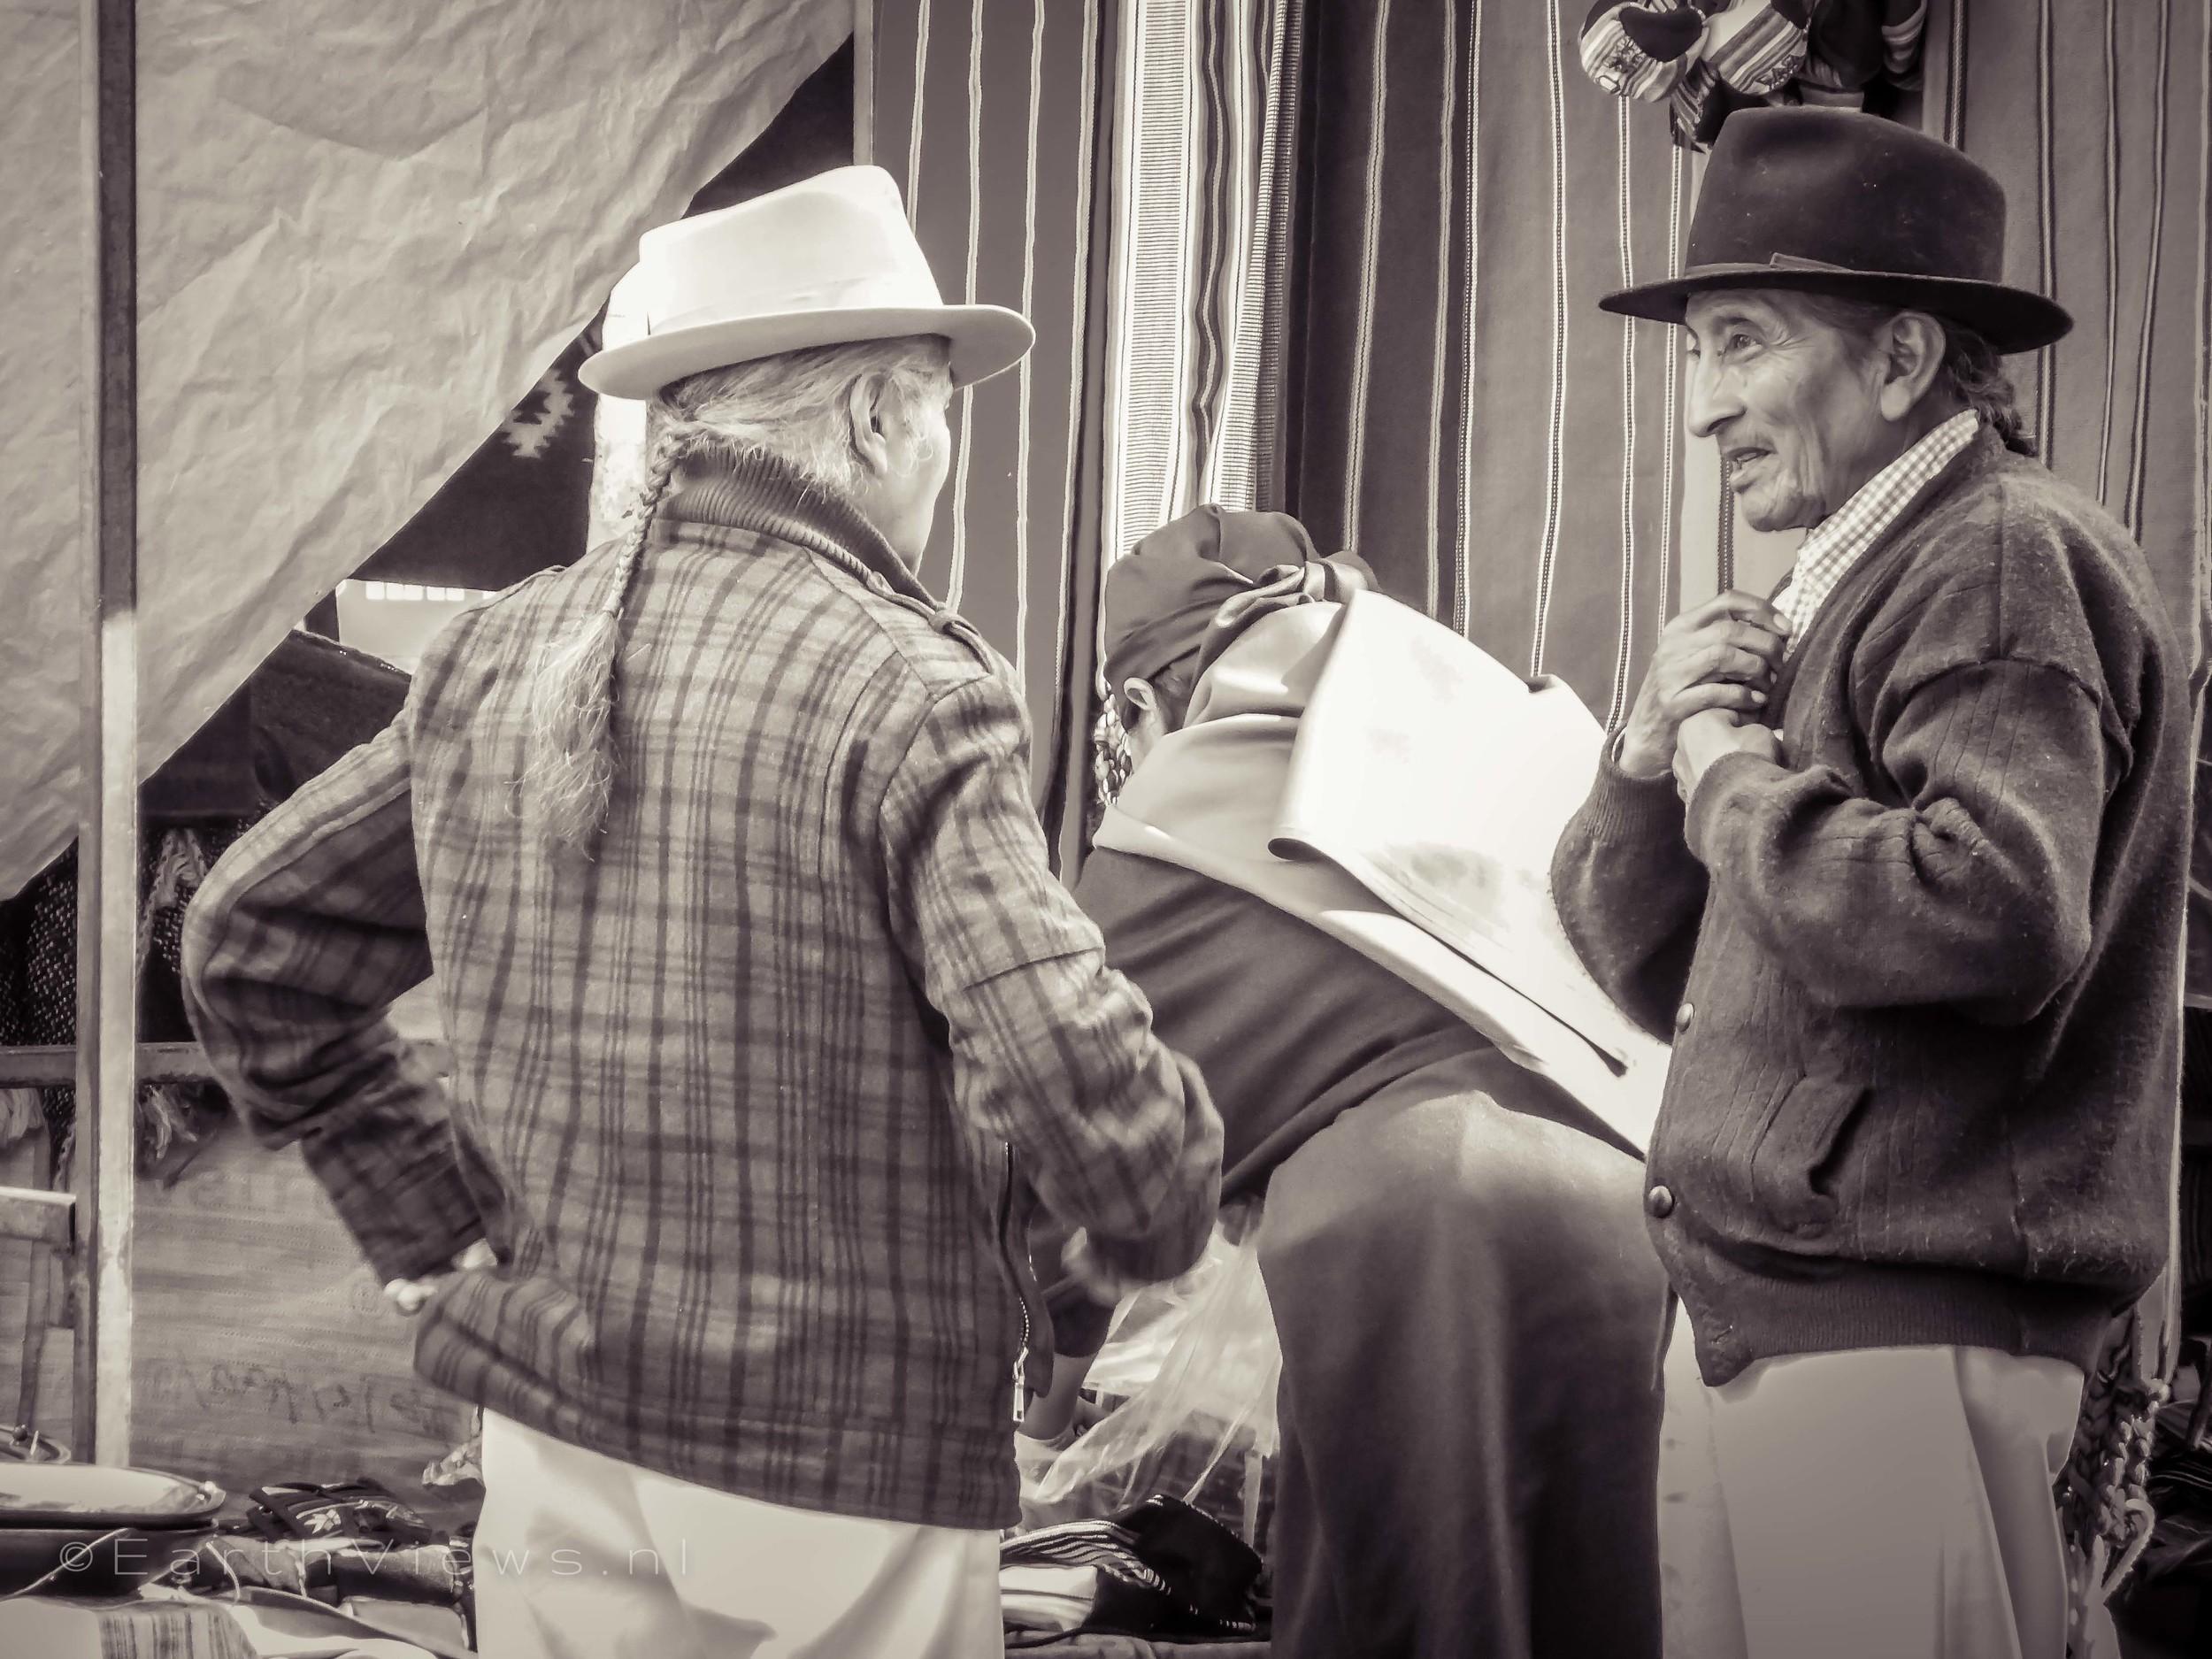 Otavaleños in traditional style on the Otavalo market.